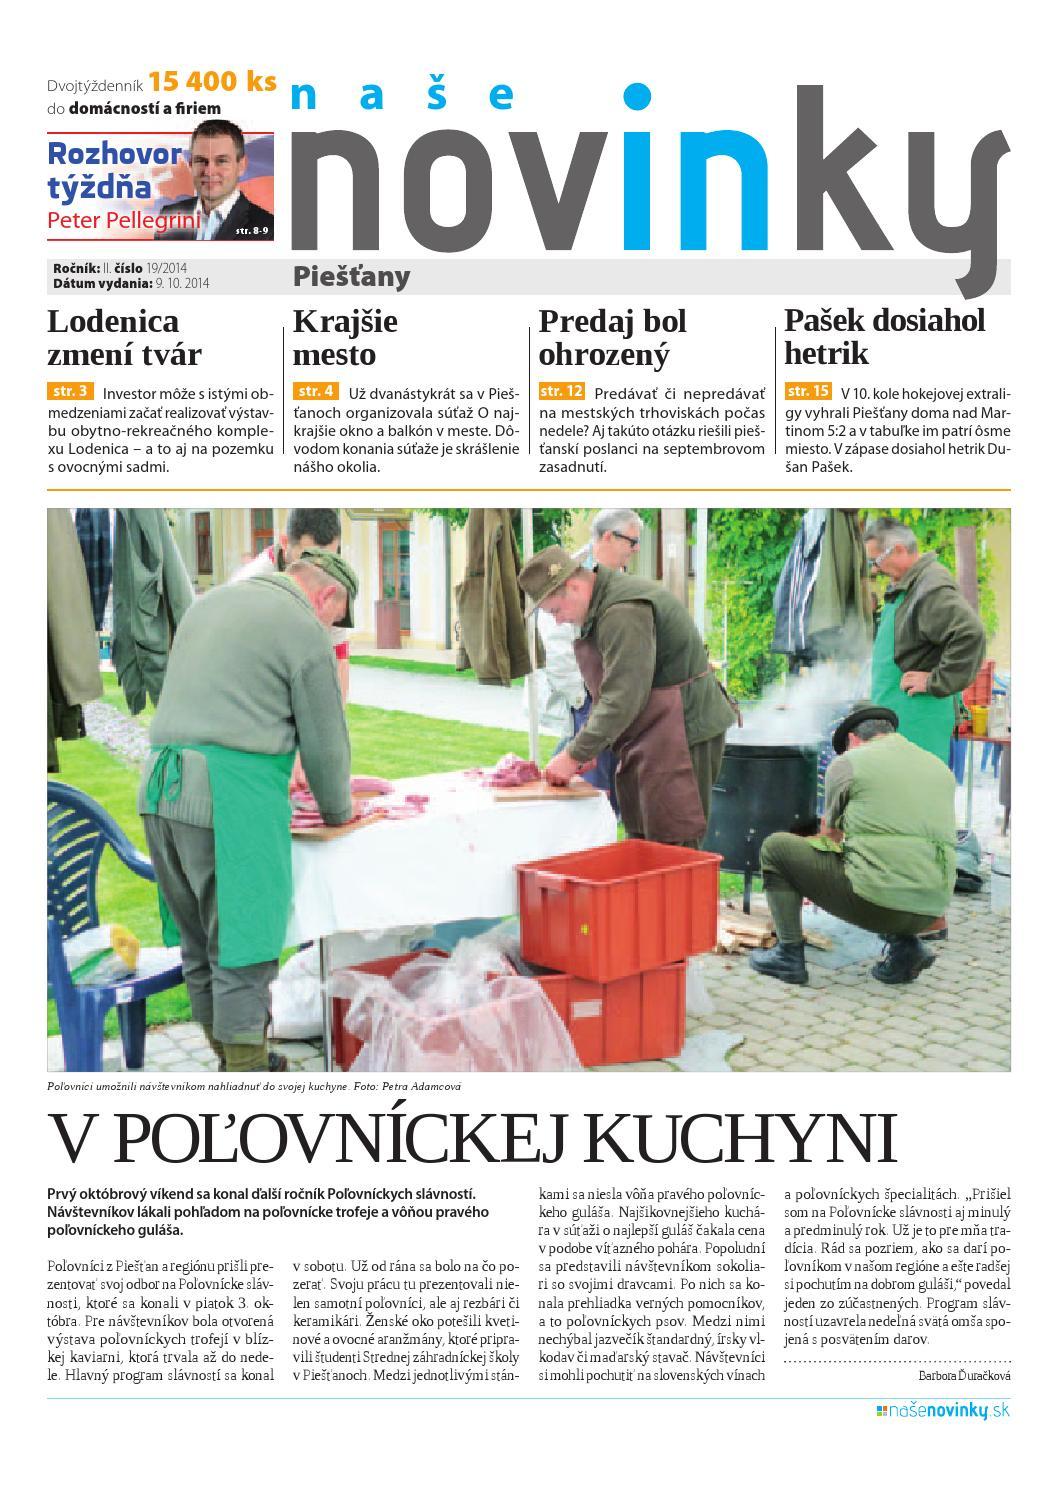 Npn 19 2014 web by 14 news - issuu 8e1c2c4d5cc